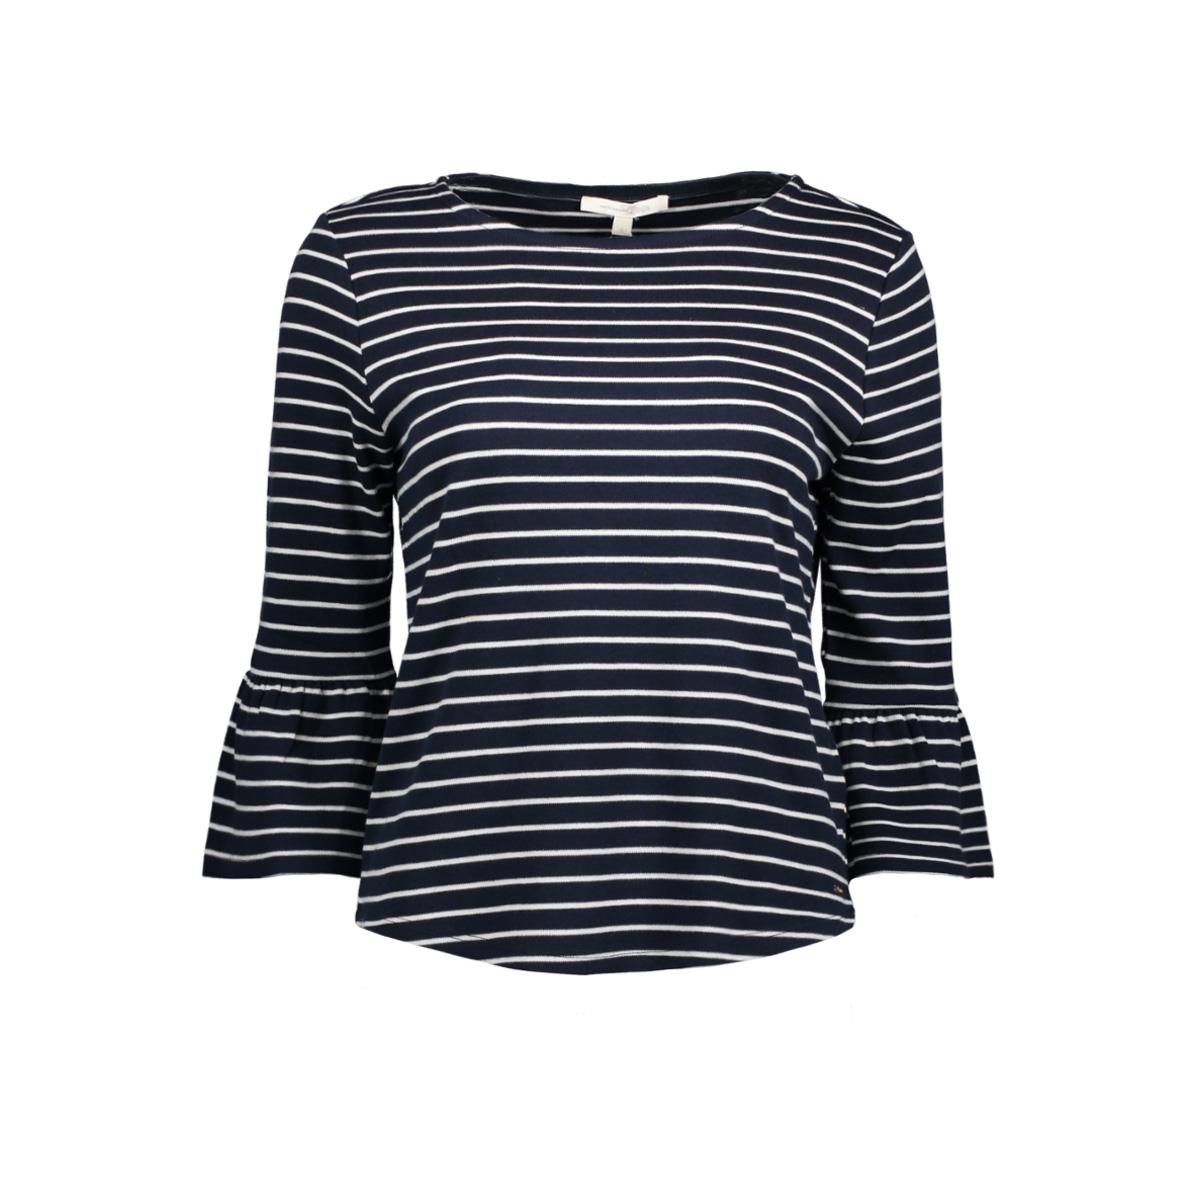 1055157.00.71 tom tailor t-shirt 6800